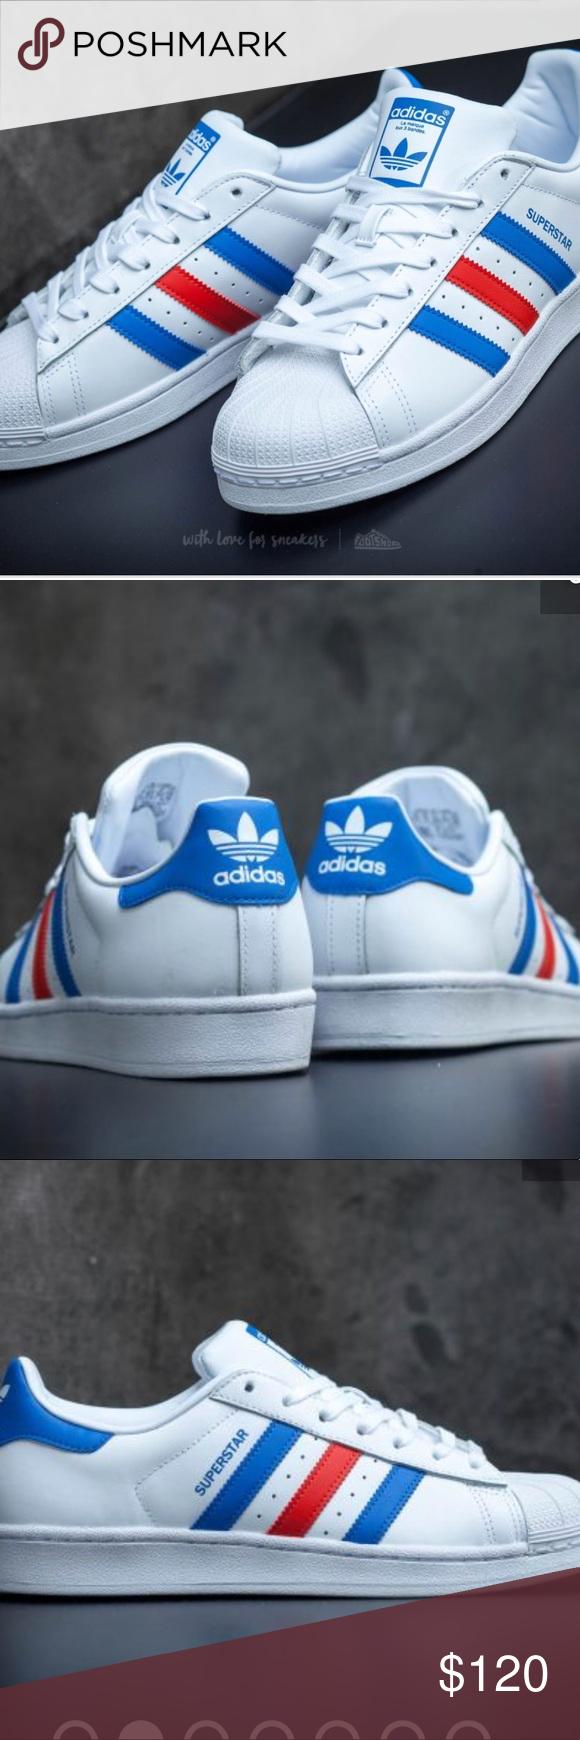 adidas superstar ftw bianco / blu / rosso nwt originali.